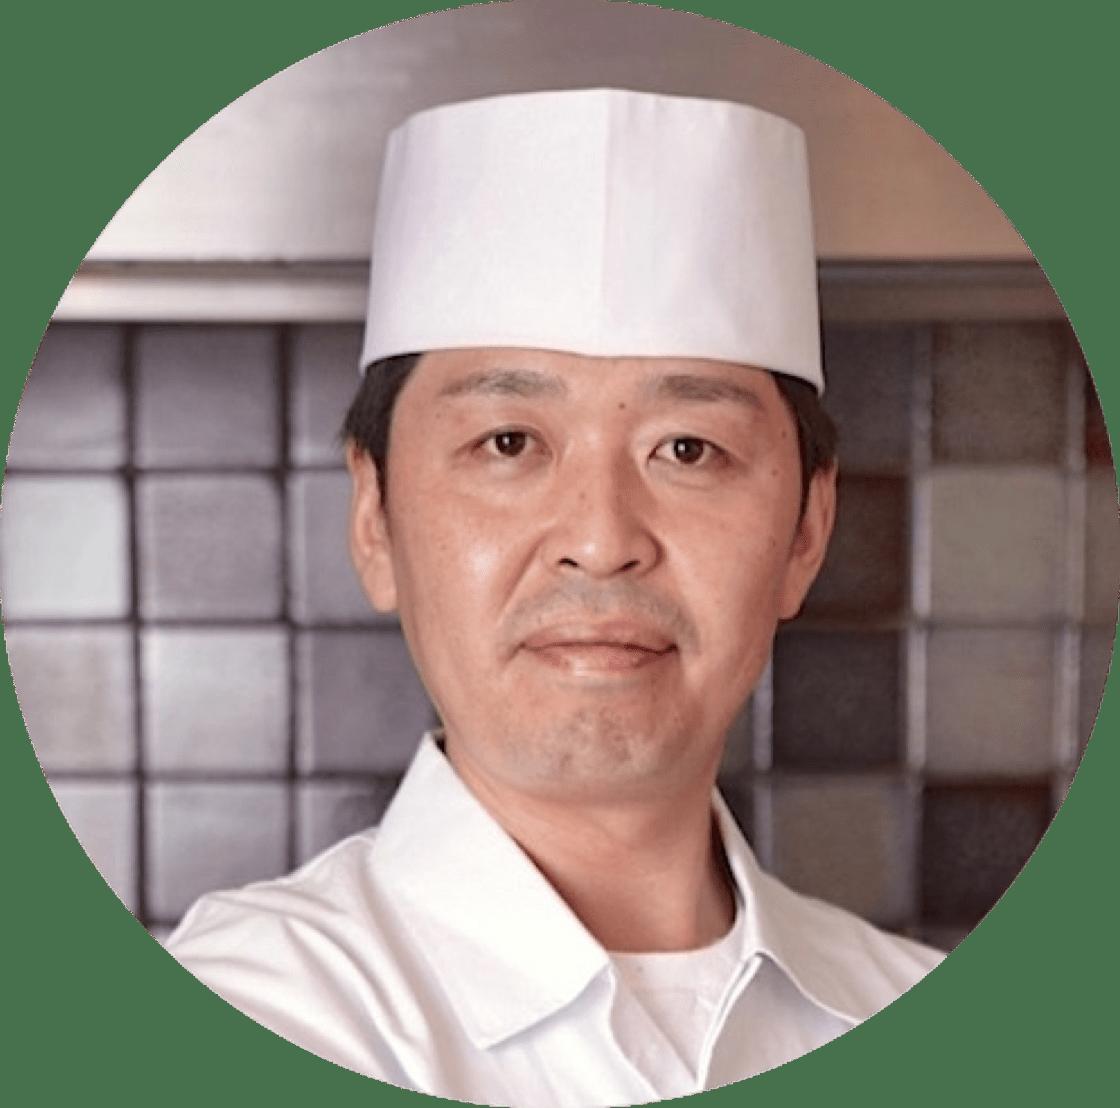 https://d3h1lg3ksw6i6b.cloudfront.net/media/image/2018/03/26/4847390fcf644412802d0658f305c464_chef_sushi_shikon.png